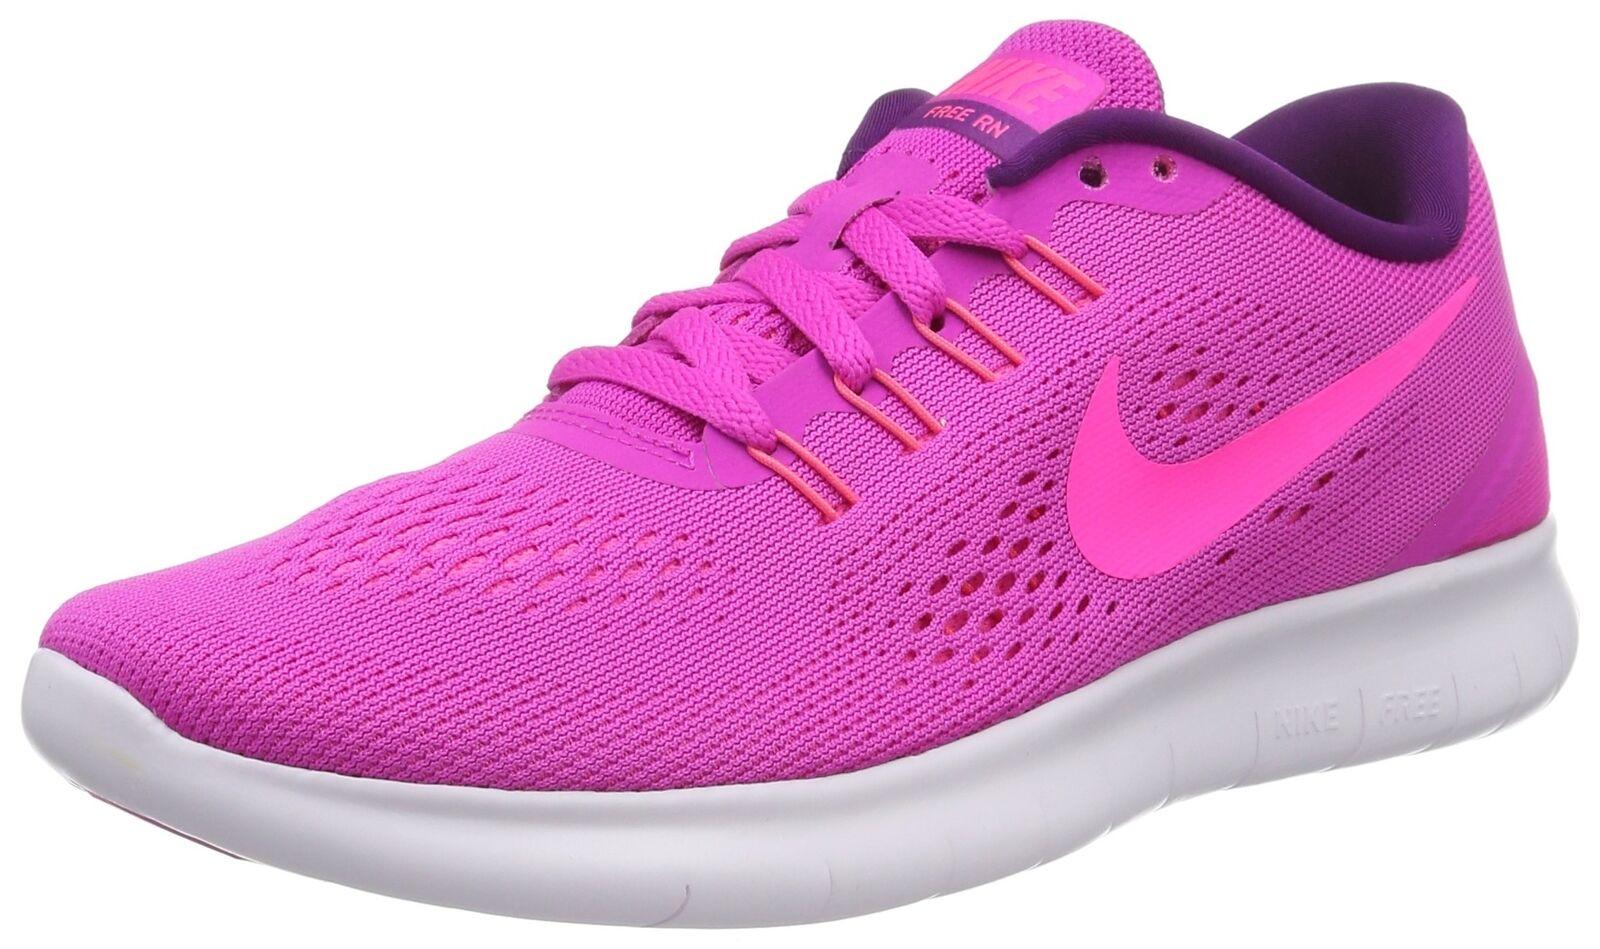 NIKE - Free RN - 831509601 Fire Pink Pink Pink bluee Glow Light purple Pink Blast 8.5 e5eb00